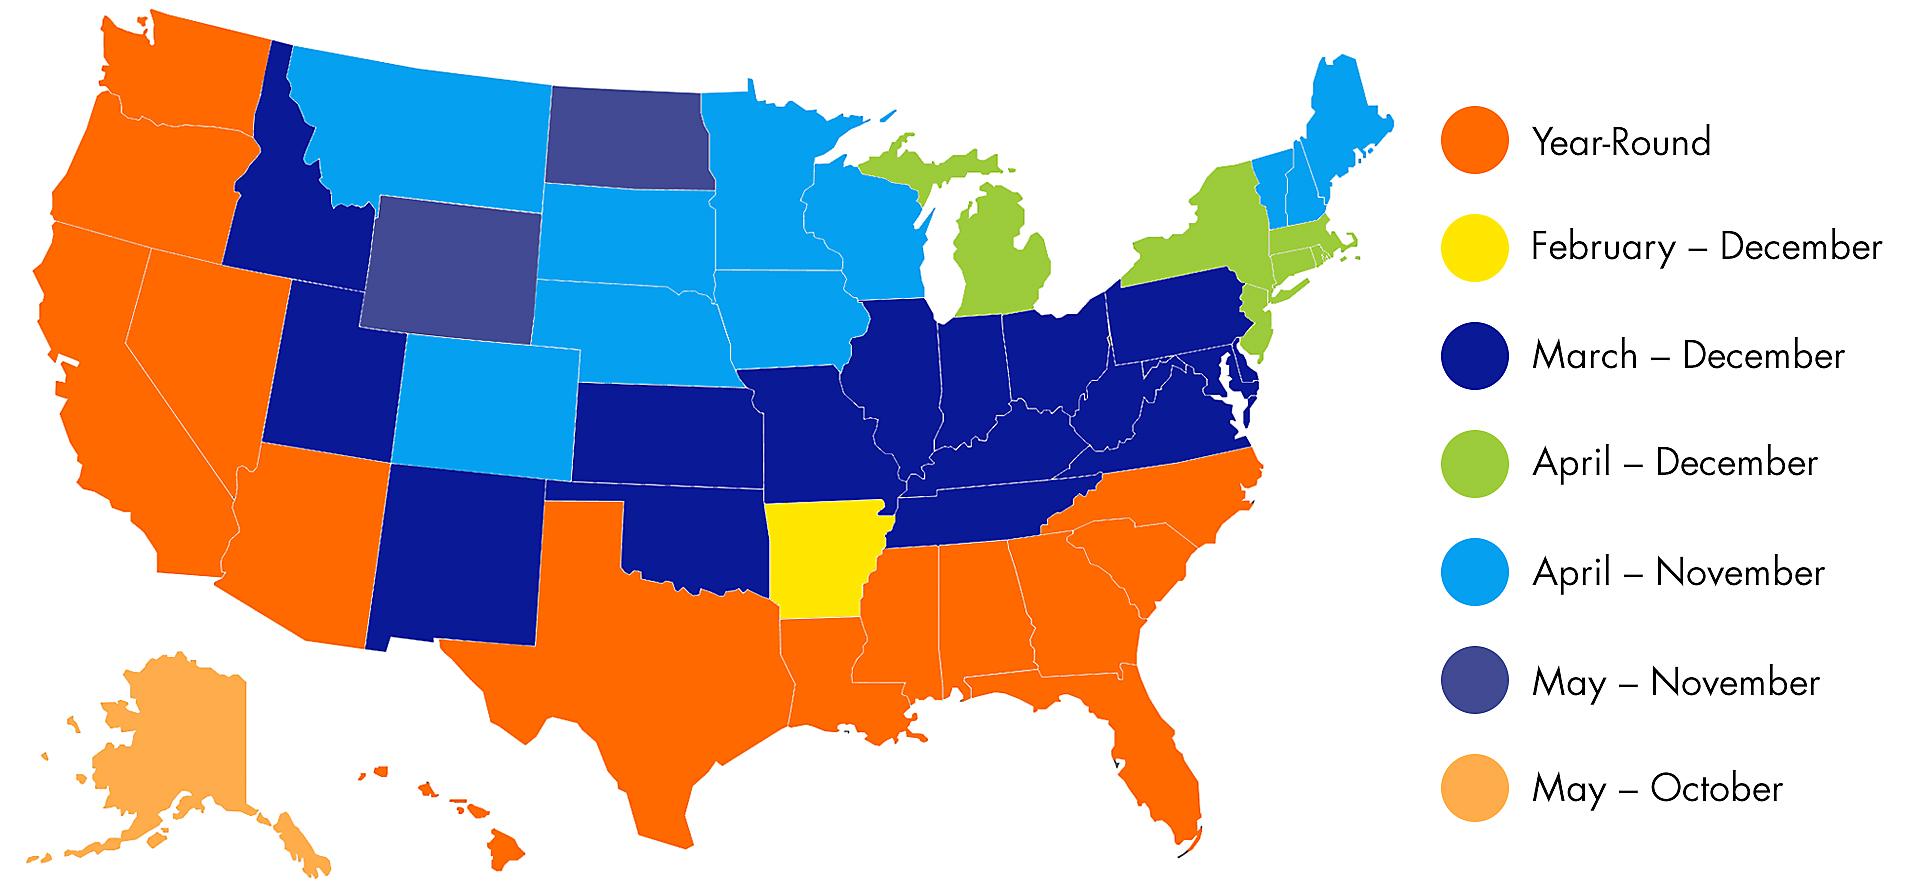 US map showing when tick and flea season occurs in each region